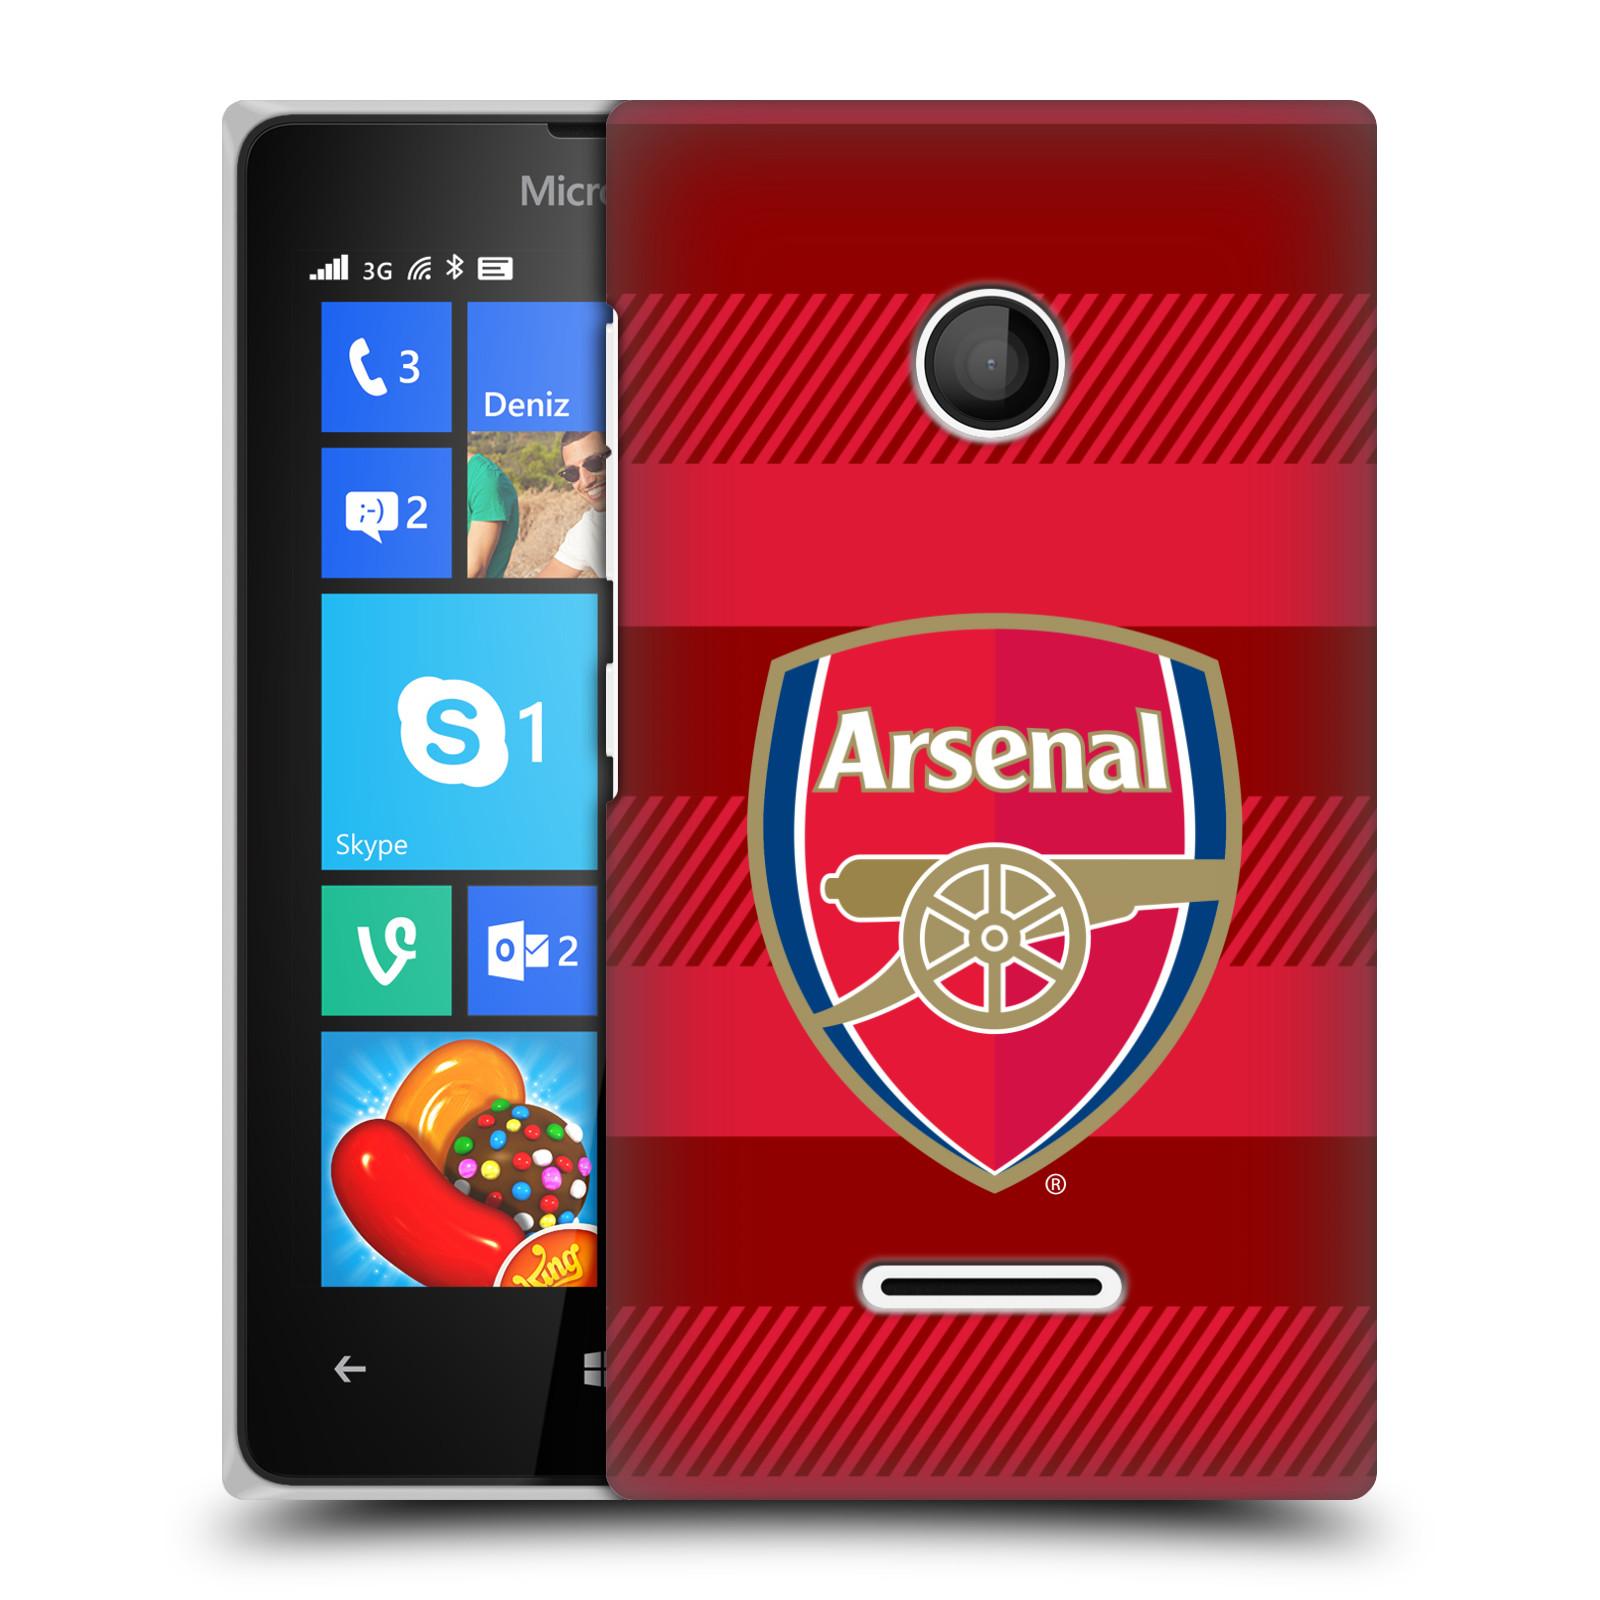 Plastové pouzdro na mobil Microsoft Lumia 435 - Head Case - Arsenal FC - Logo s pruhy